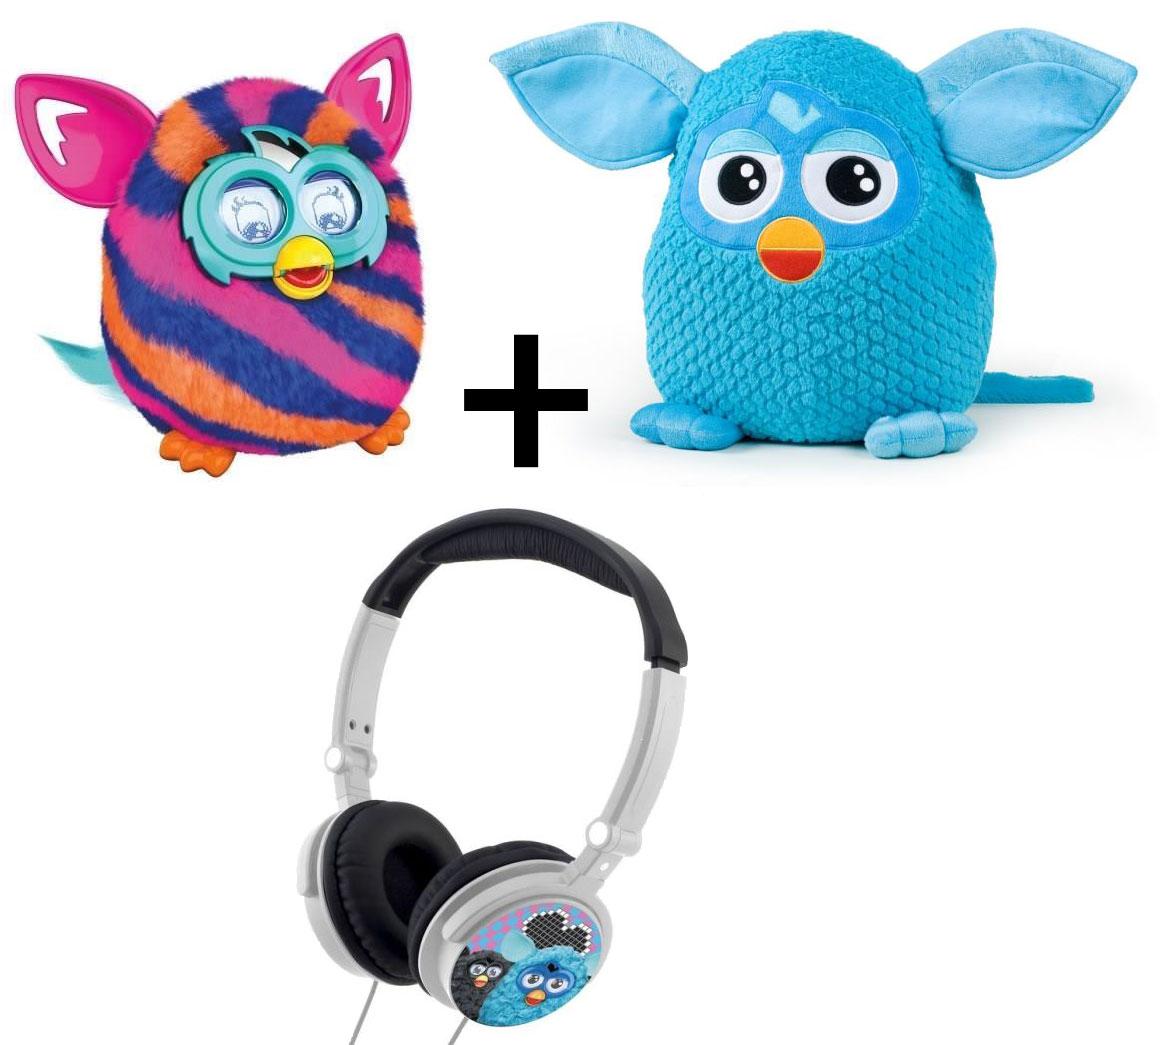 Furby Boom Sunny/Sweet plusieurs coloris + Furby Bleu 45 cm + Casque audio Furby